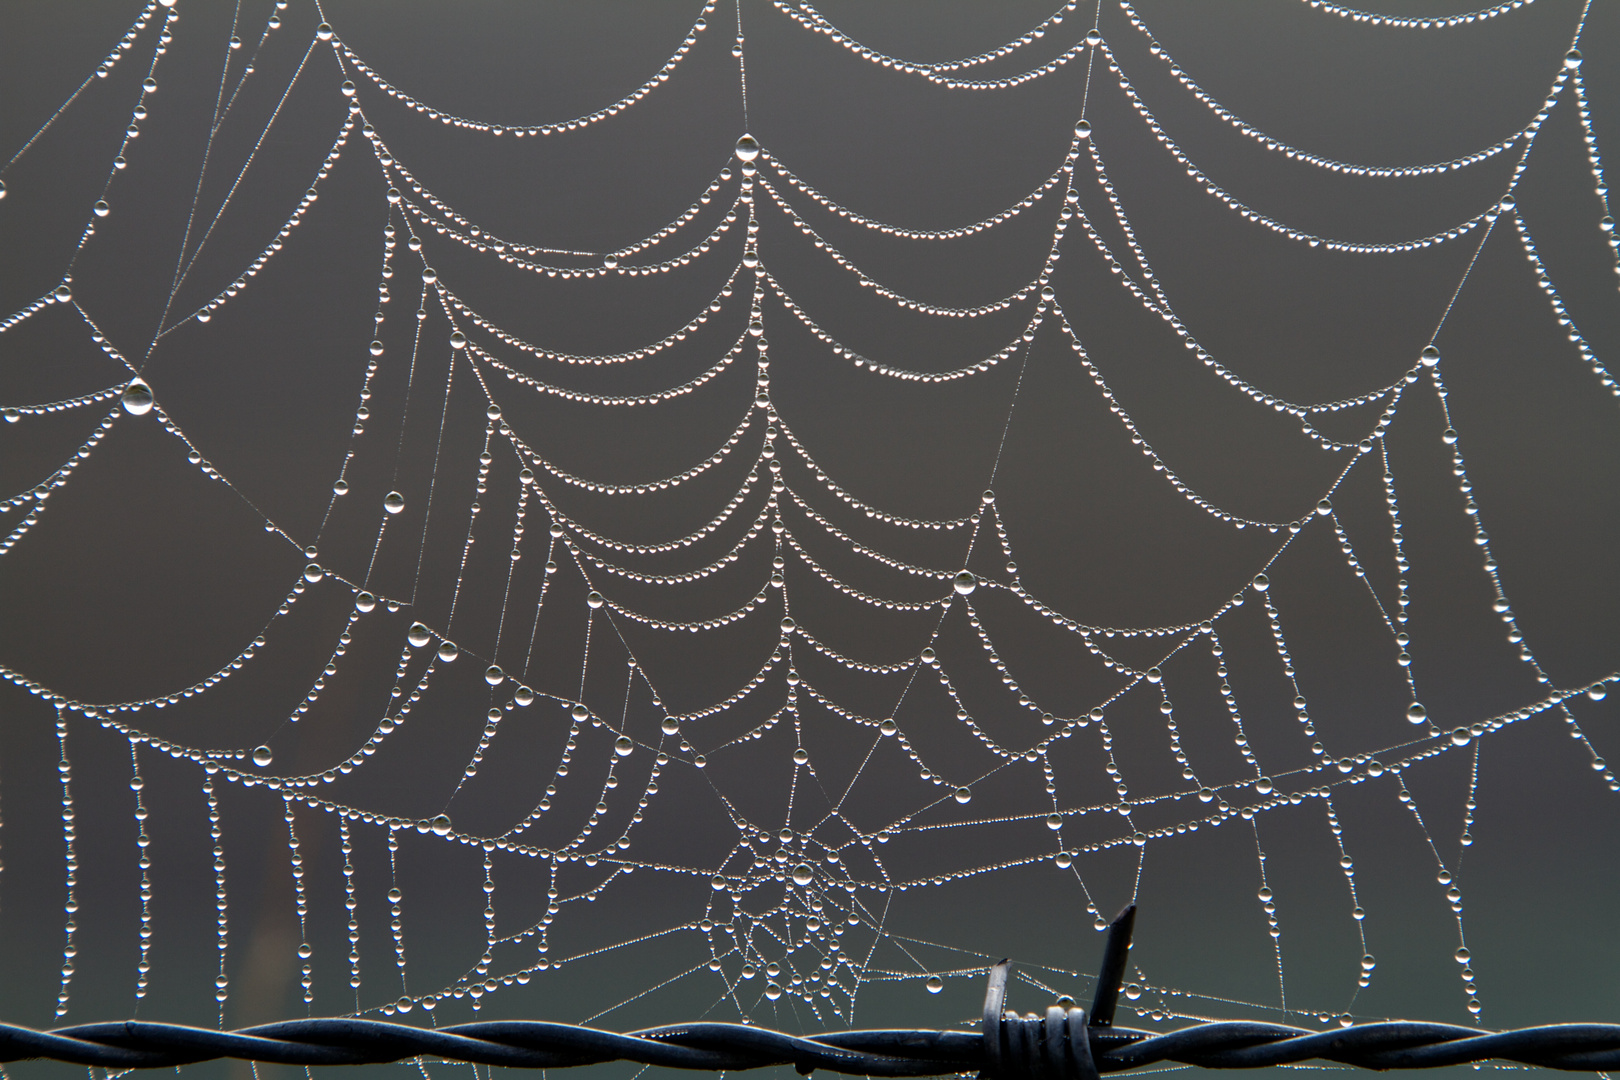 Spinnennetz - Nr. 5121